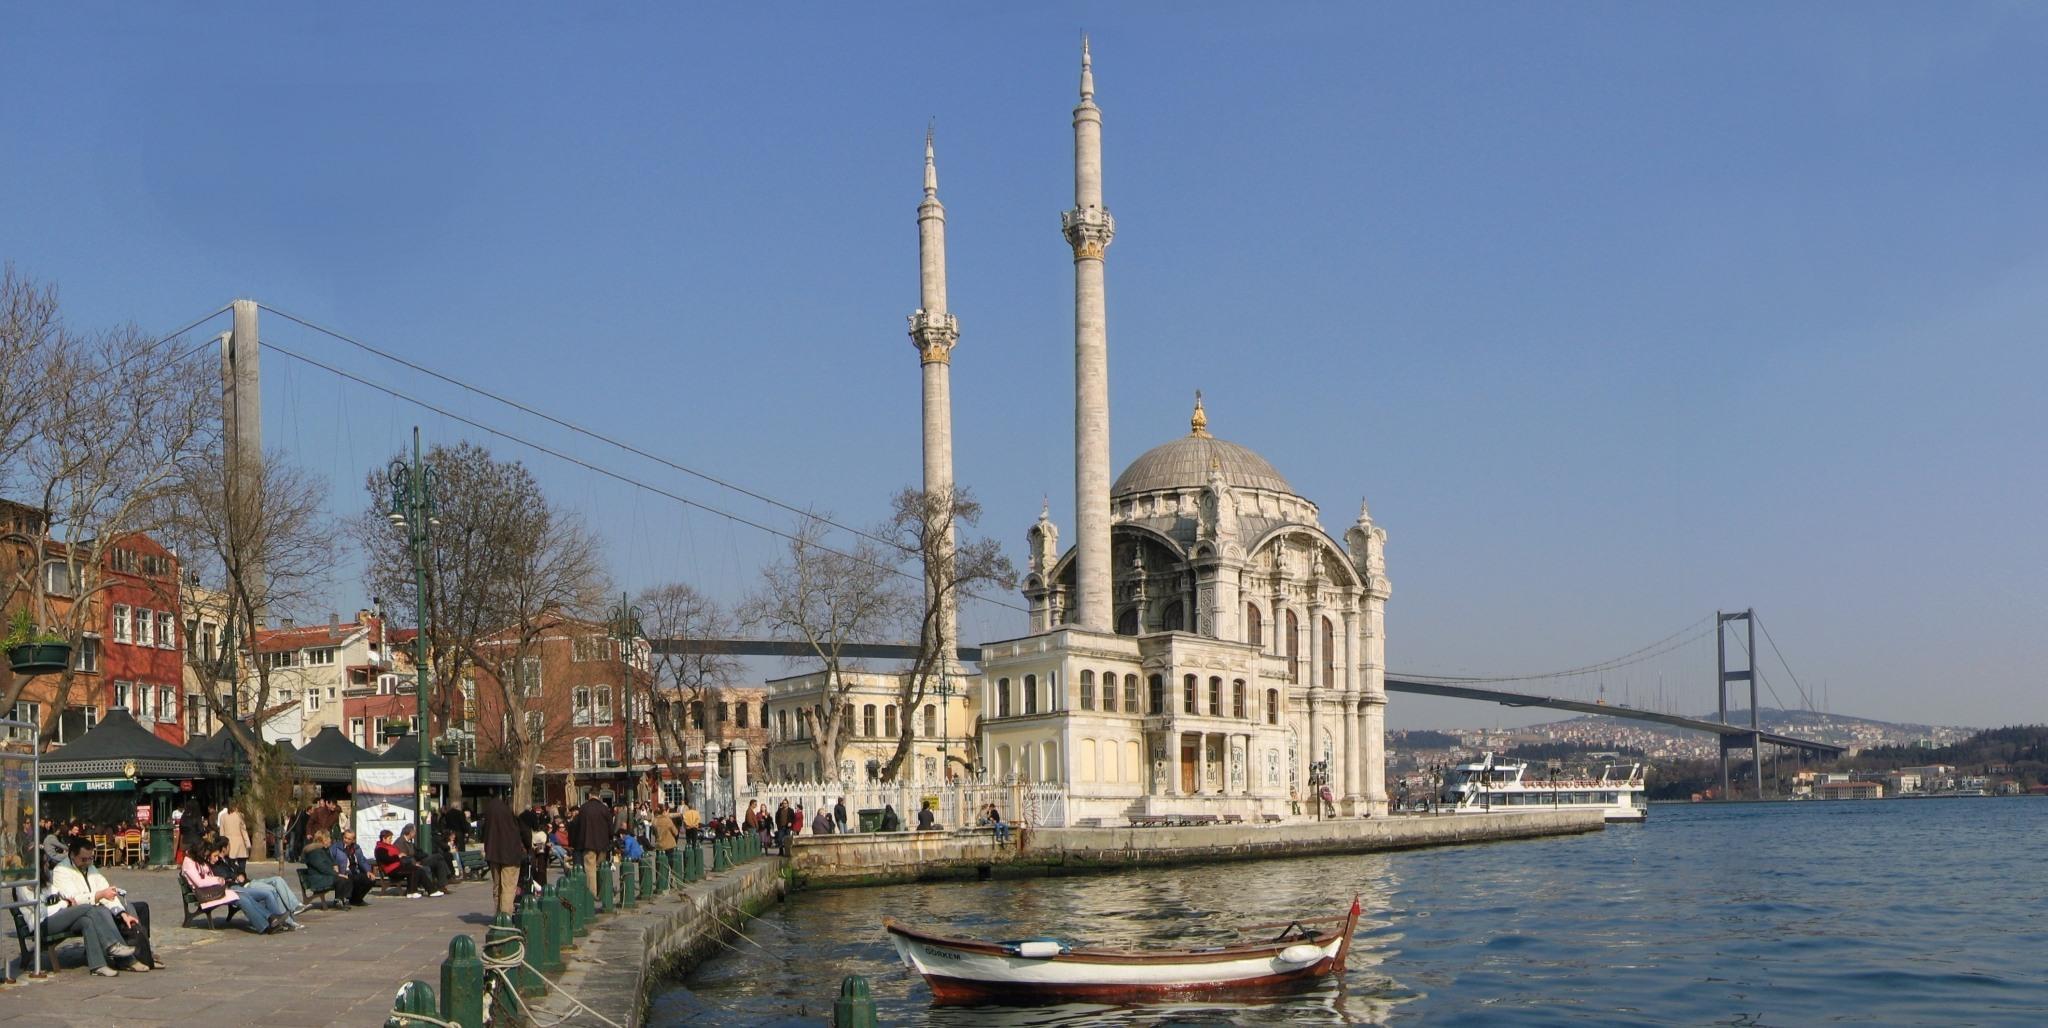 Ortakoey_Istanbul_Bosporusbruecke_Mrz2005